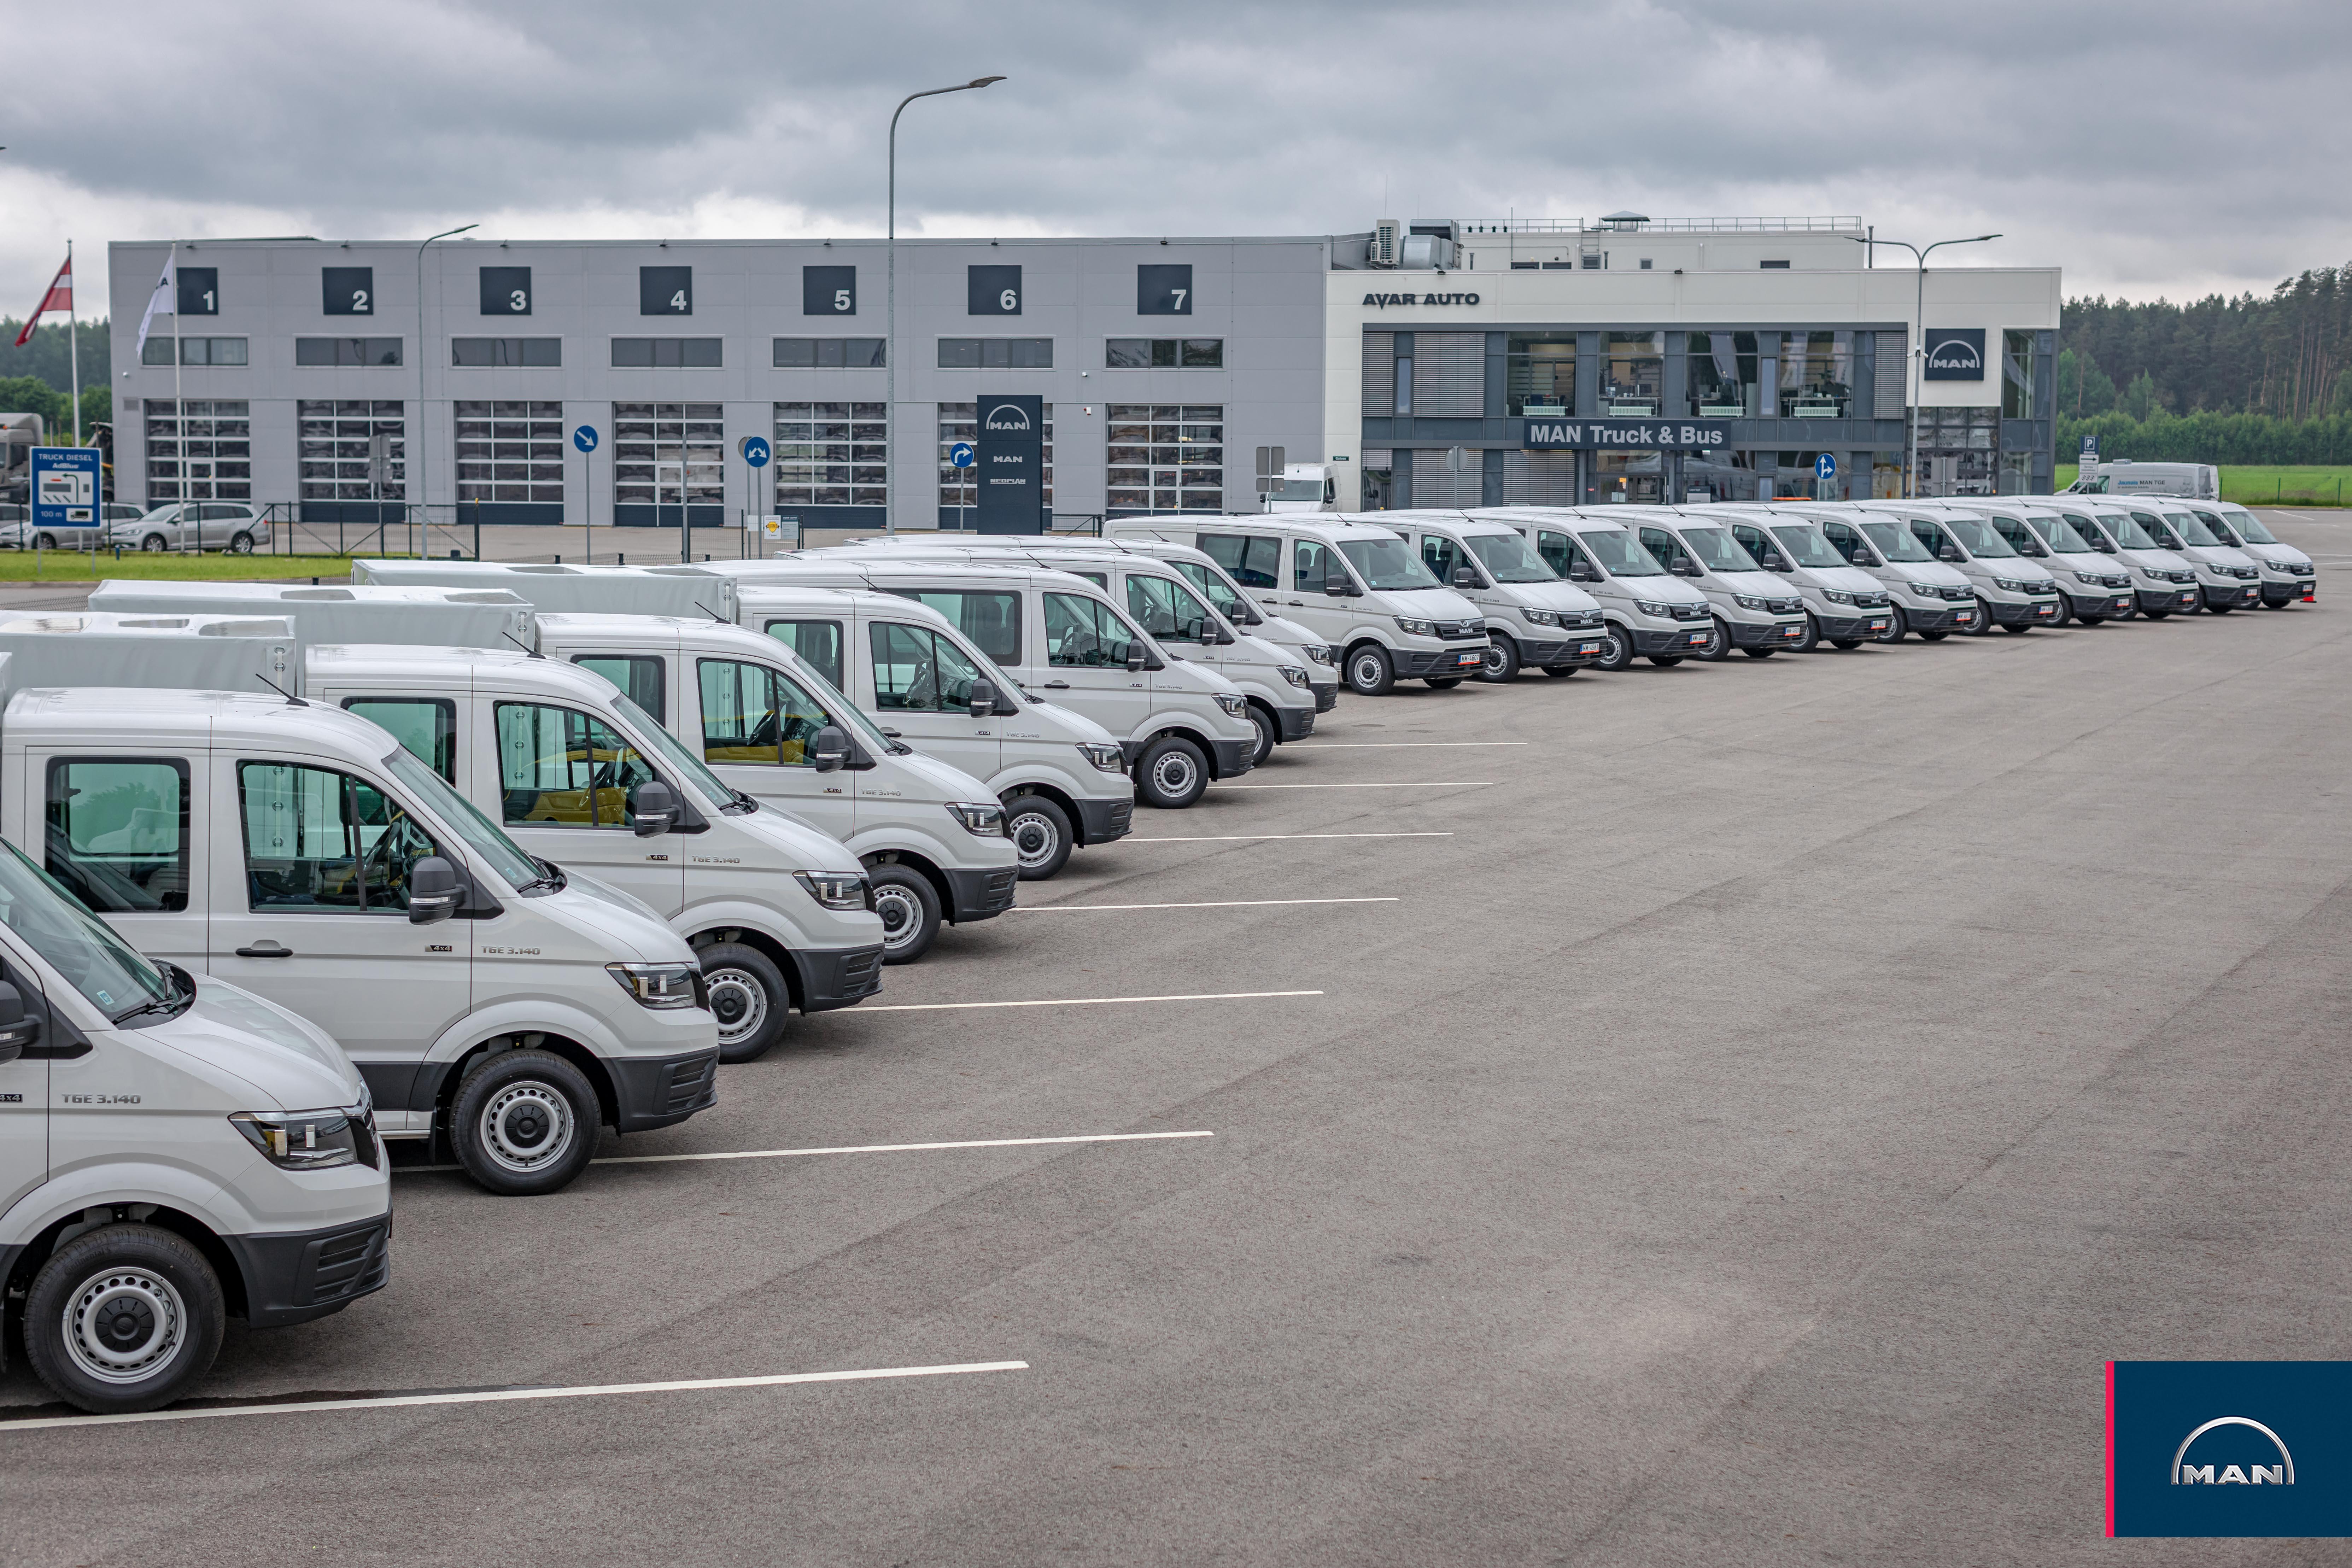 19 new MAN TGE vans delivered to Latvian railway